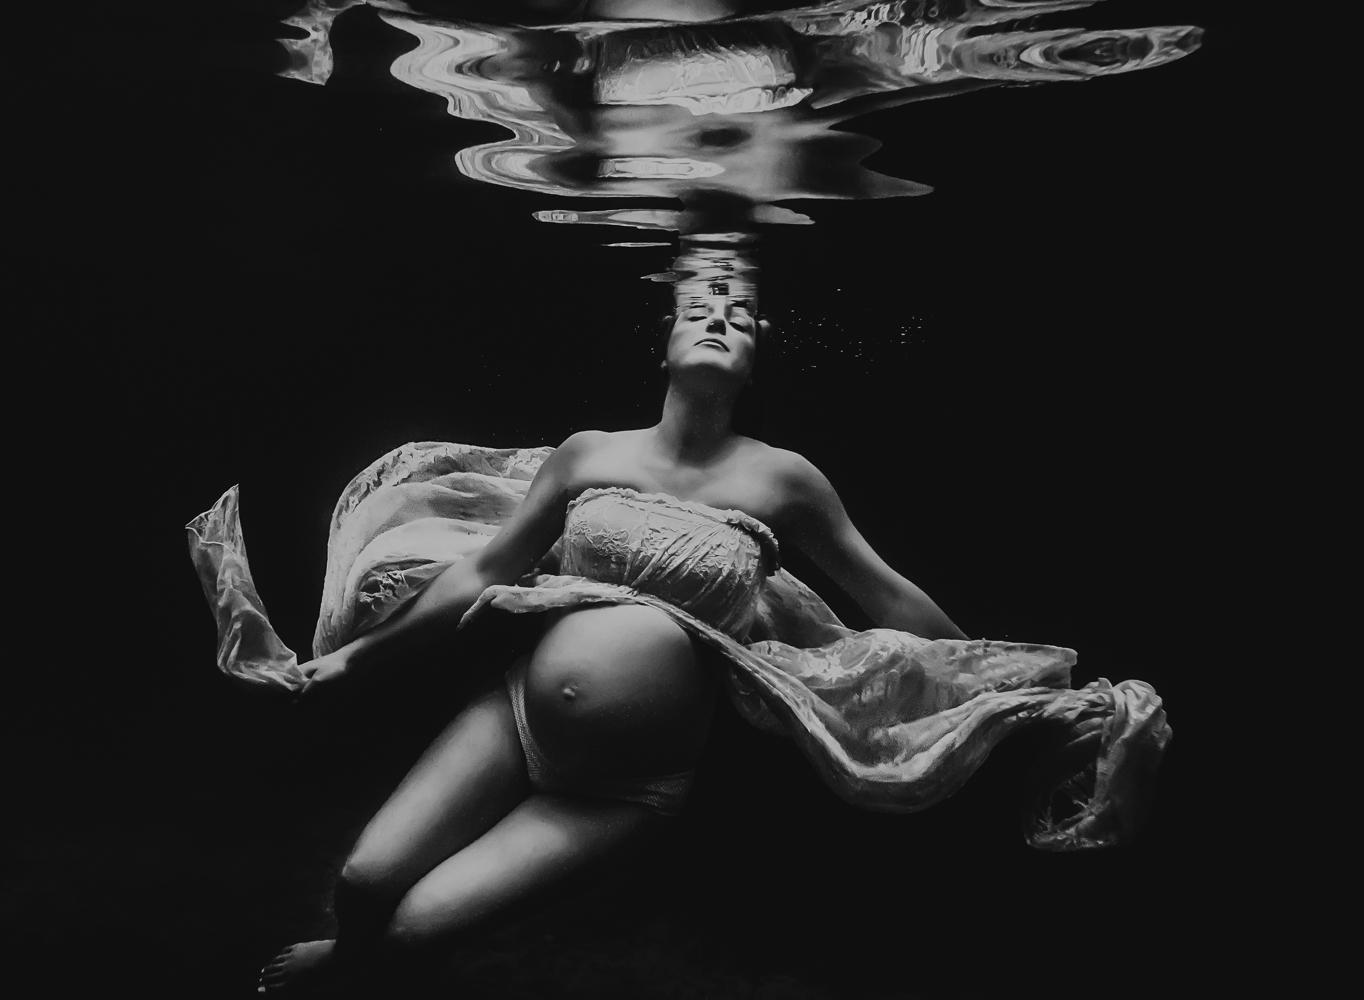 Kelly-Park-Maternity-Underwater-Maternity-Cooper-Erika-Reiner-Photography2 (67 of 77).jpg